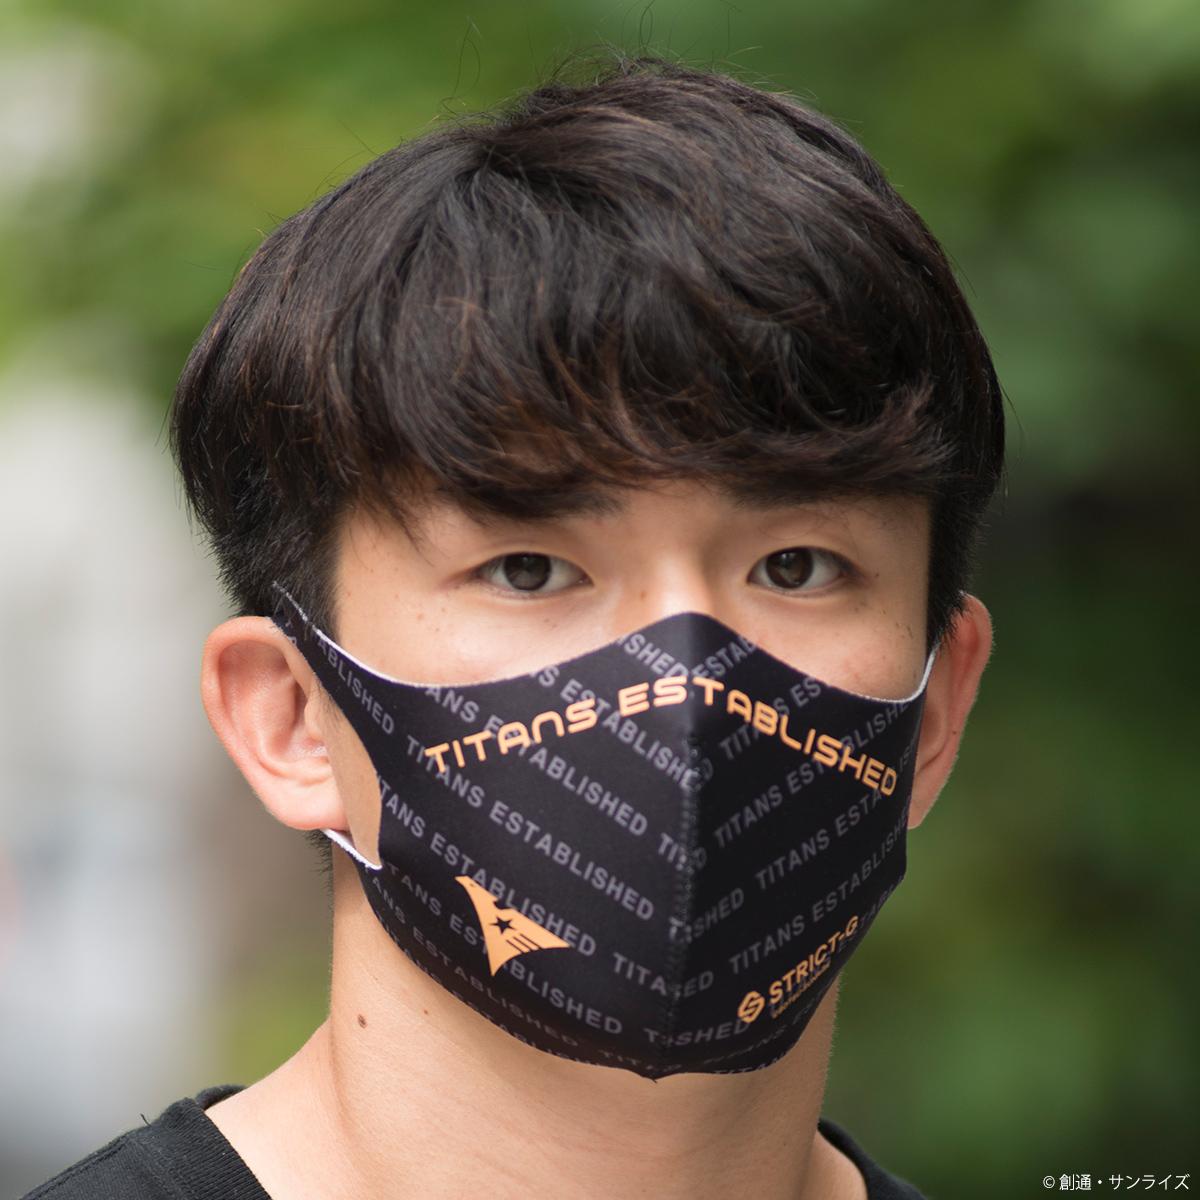 STRICT-G『機動戦士Zガンダム』 フェイスカバー TITANS柄